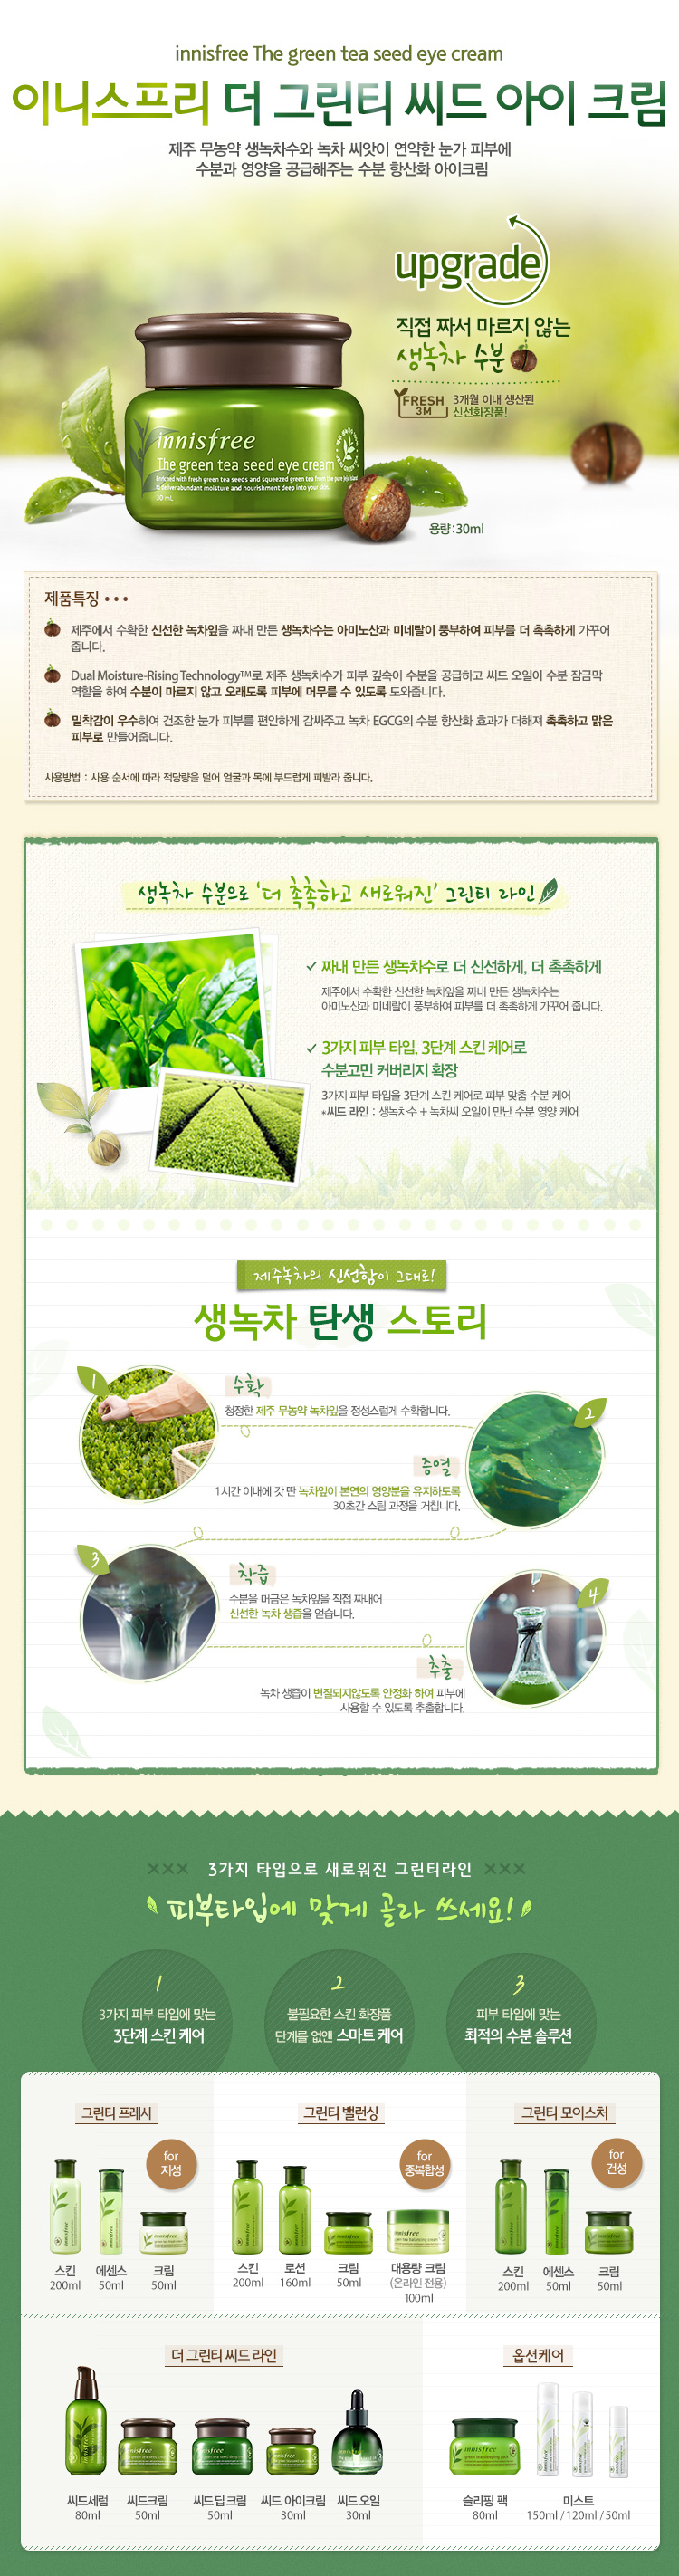 The Green Tea Seed Eye Cream 30ml Innisfree Heize Detail